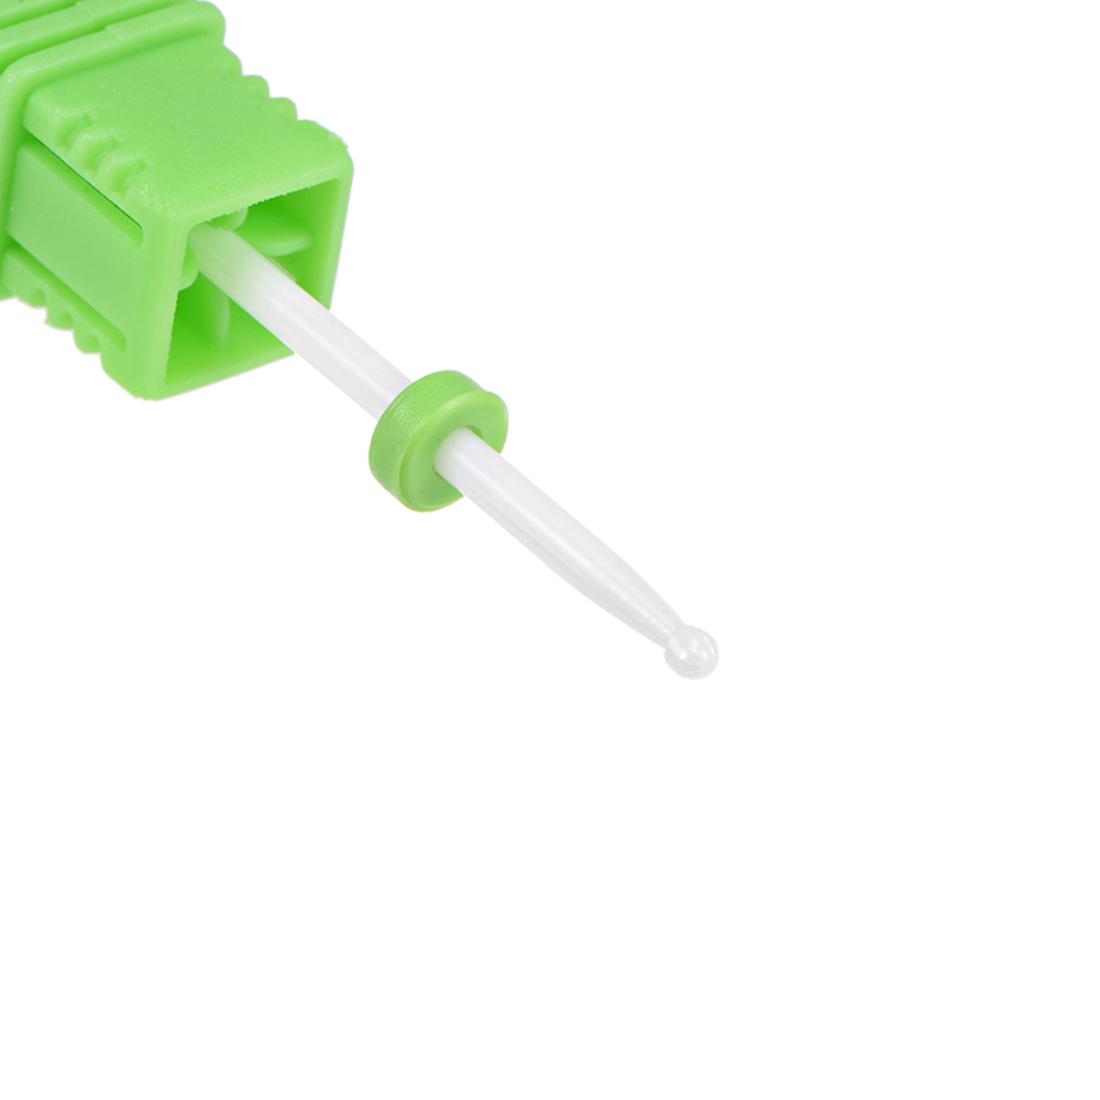 Ceramic Nail Drill Bits 3/32 inch (Coarse Grit) Cuticle Gel Remove